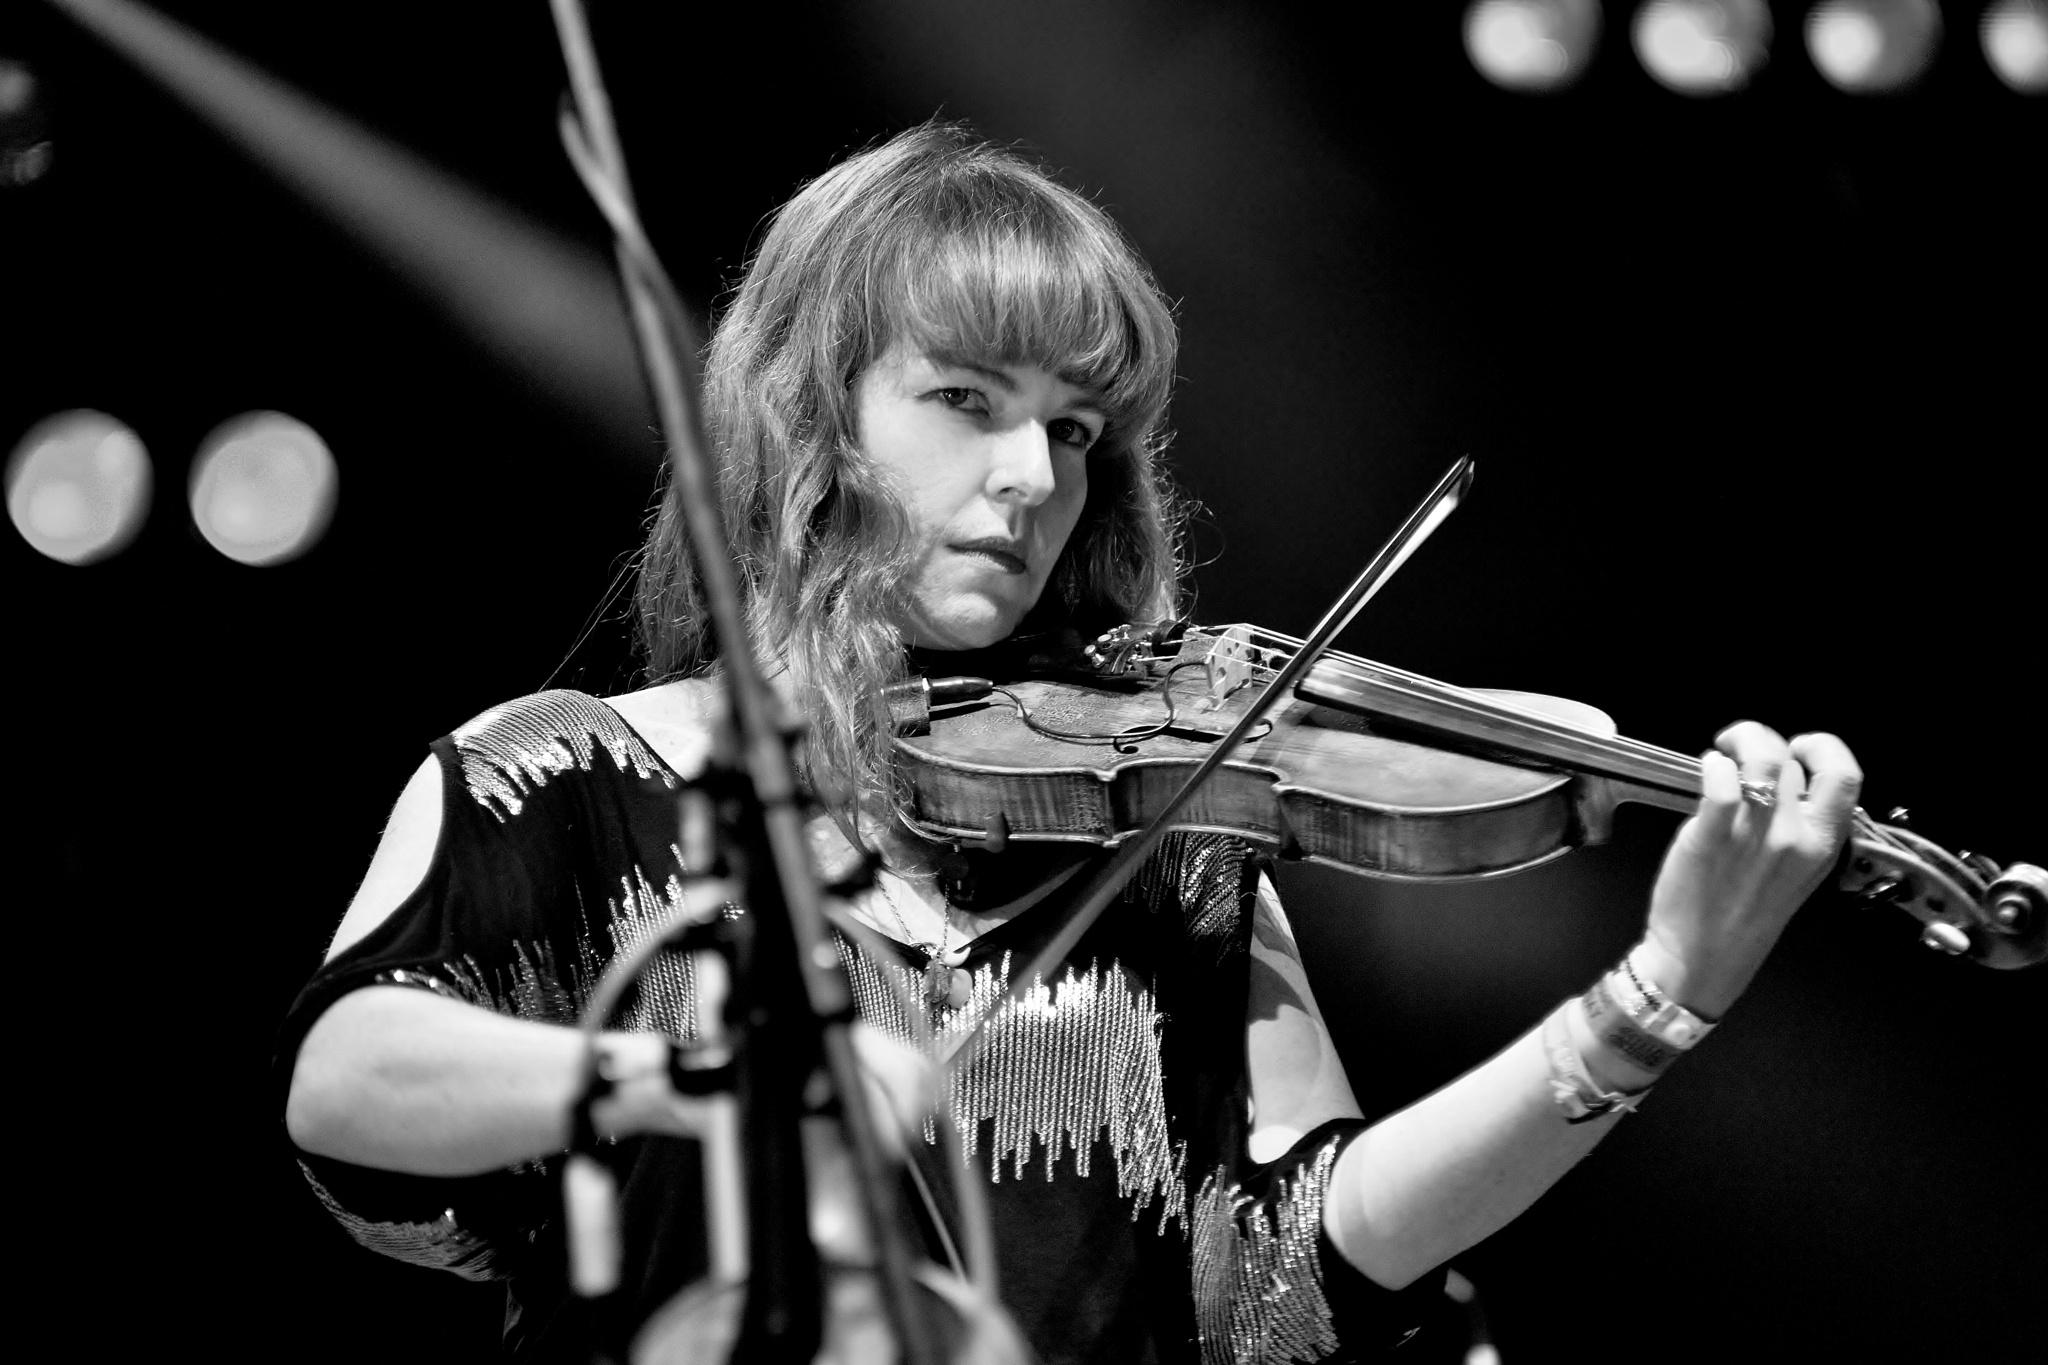 Shrewsbury Folk Festival - Sweet Music - Monochrome by paul.hosker